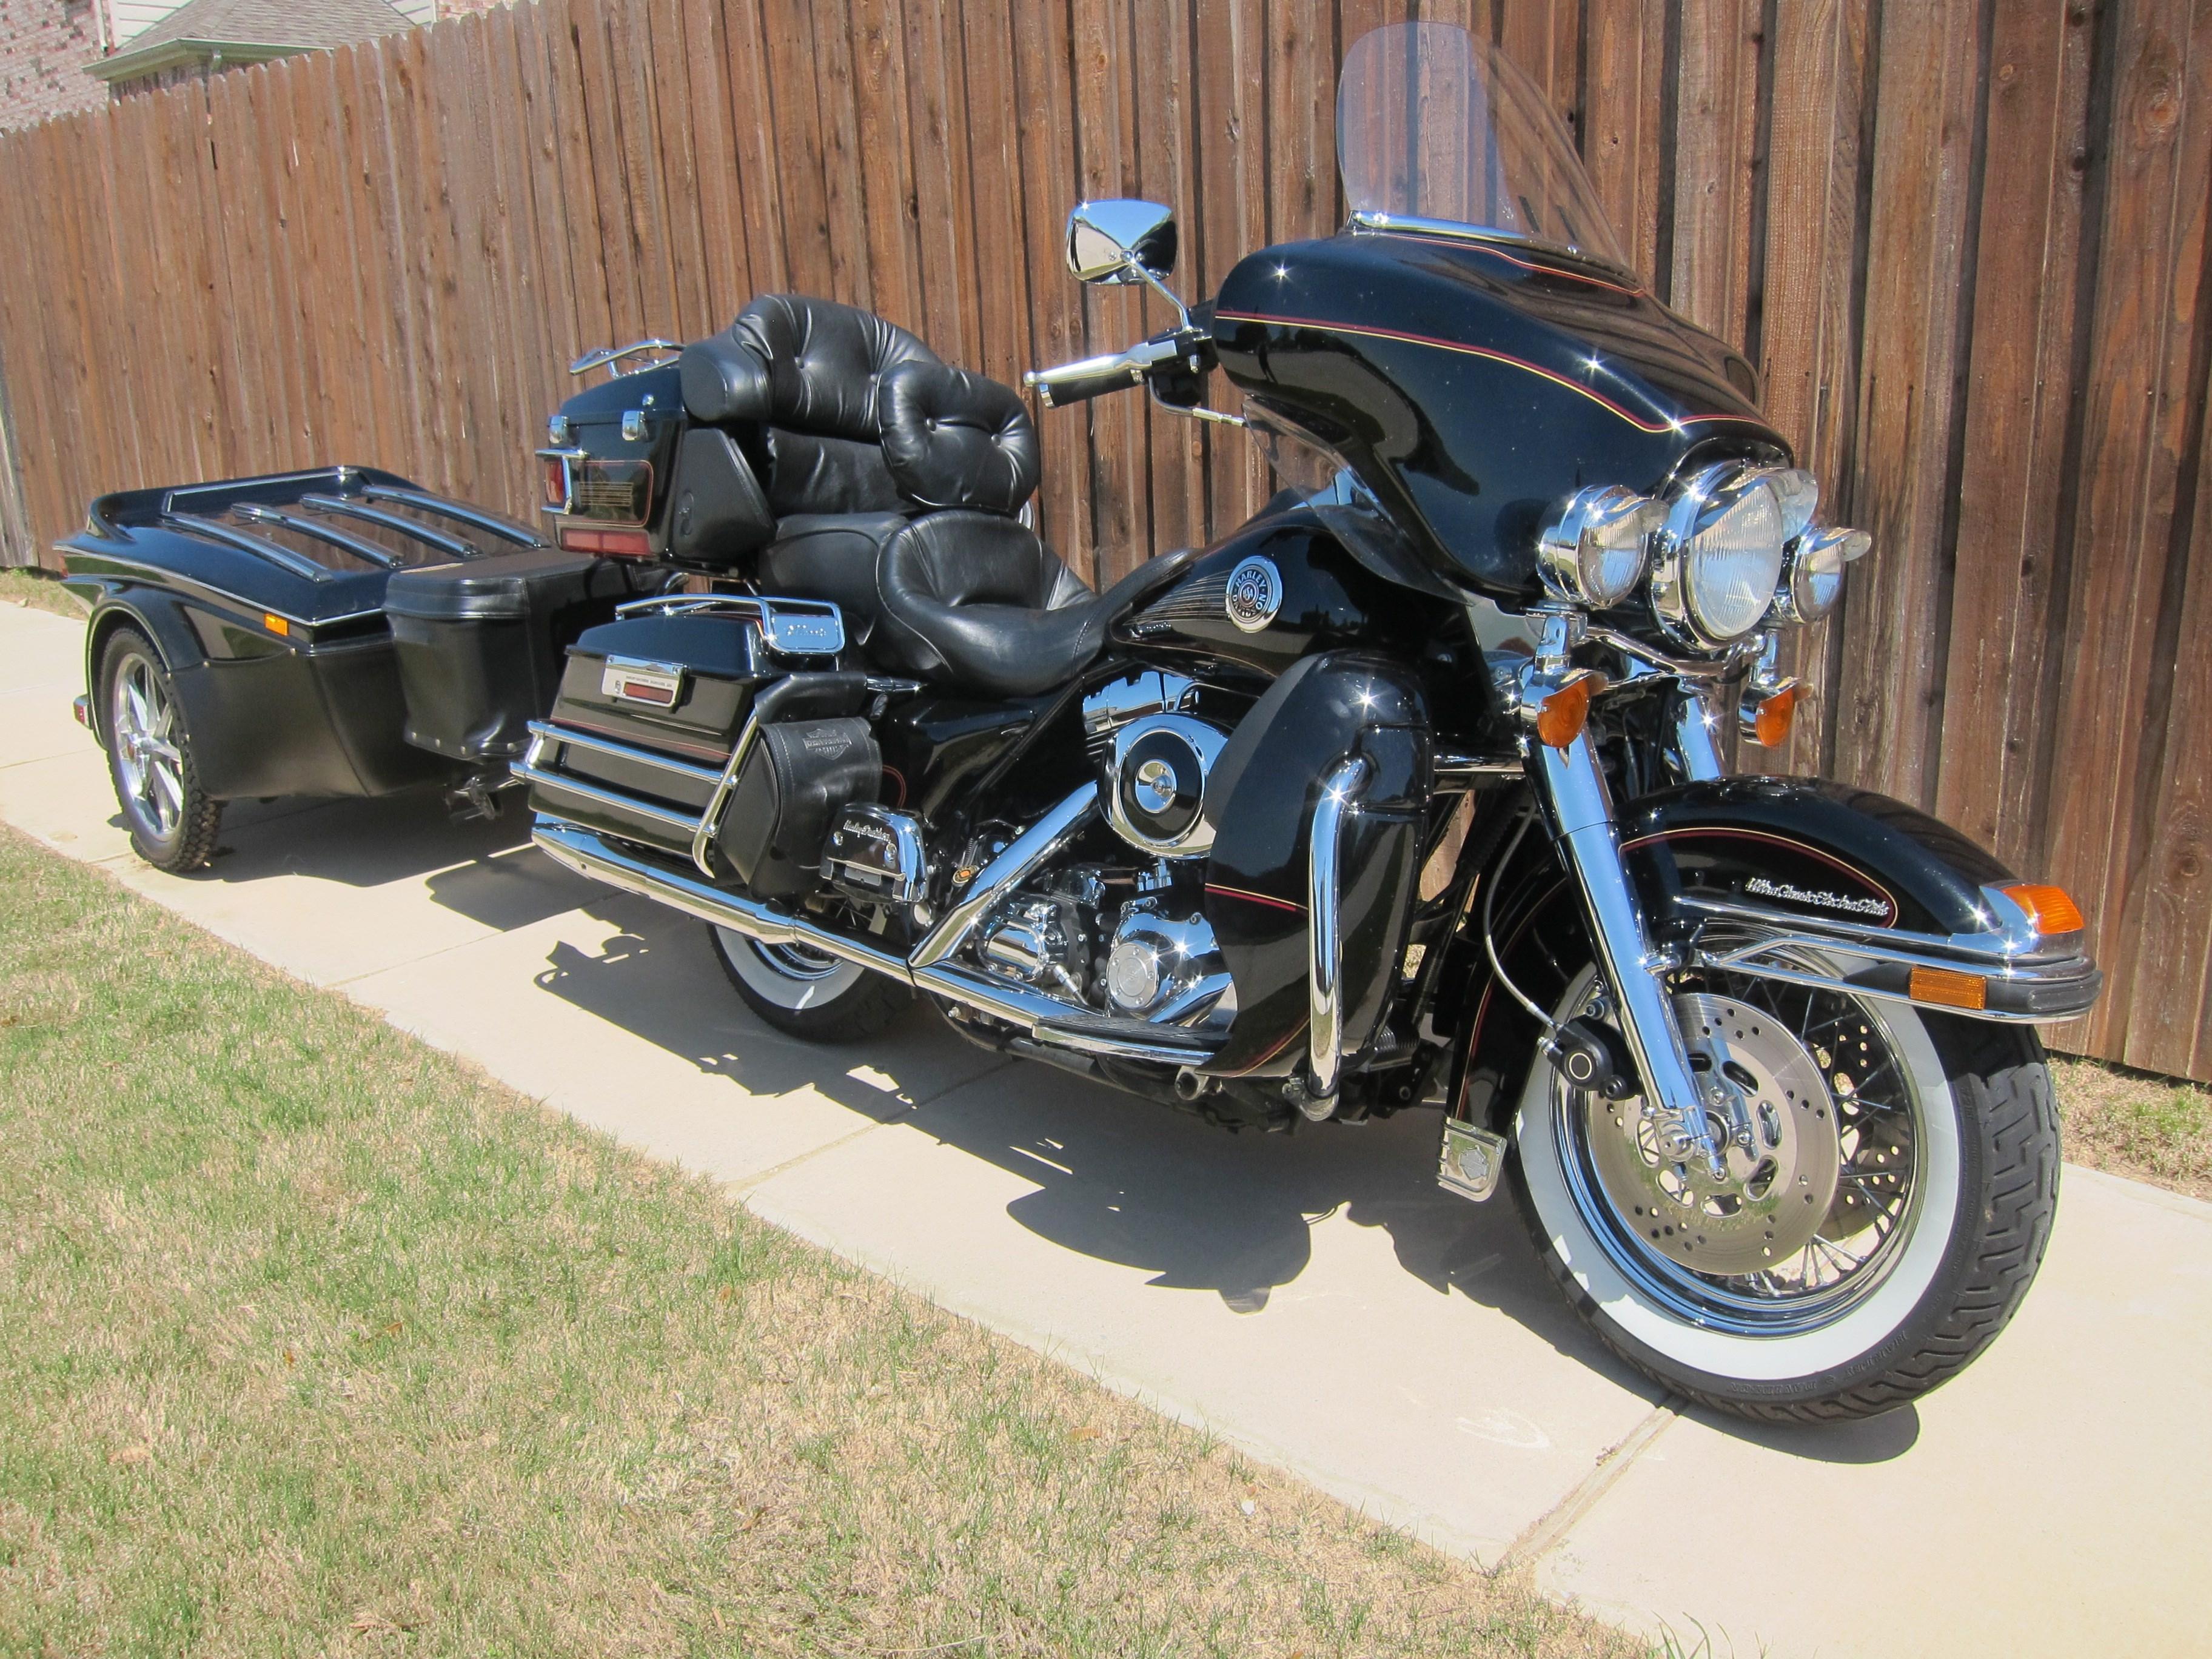 1999 Harley Davidson 174 Flhtcui Ultra Classic 174 Electra Glide